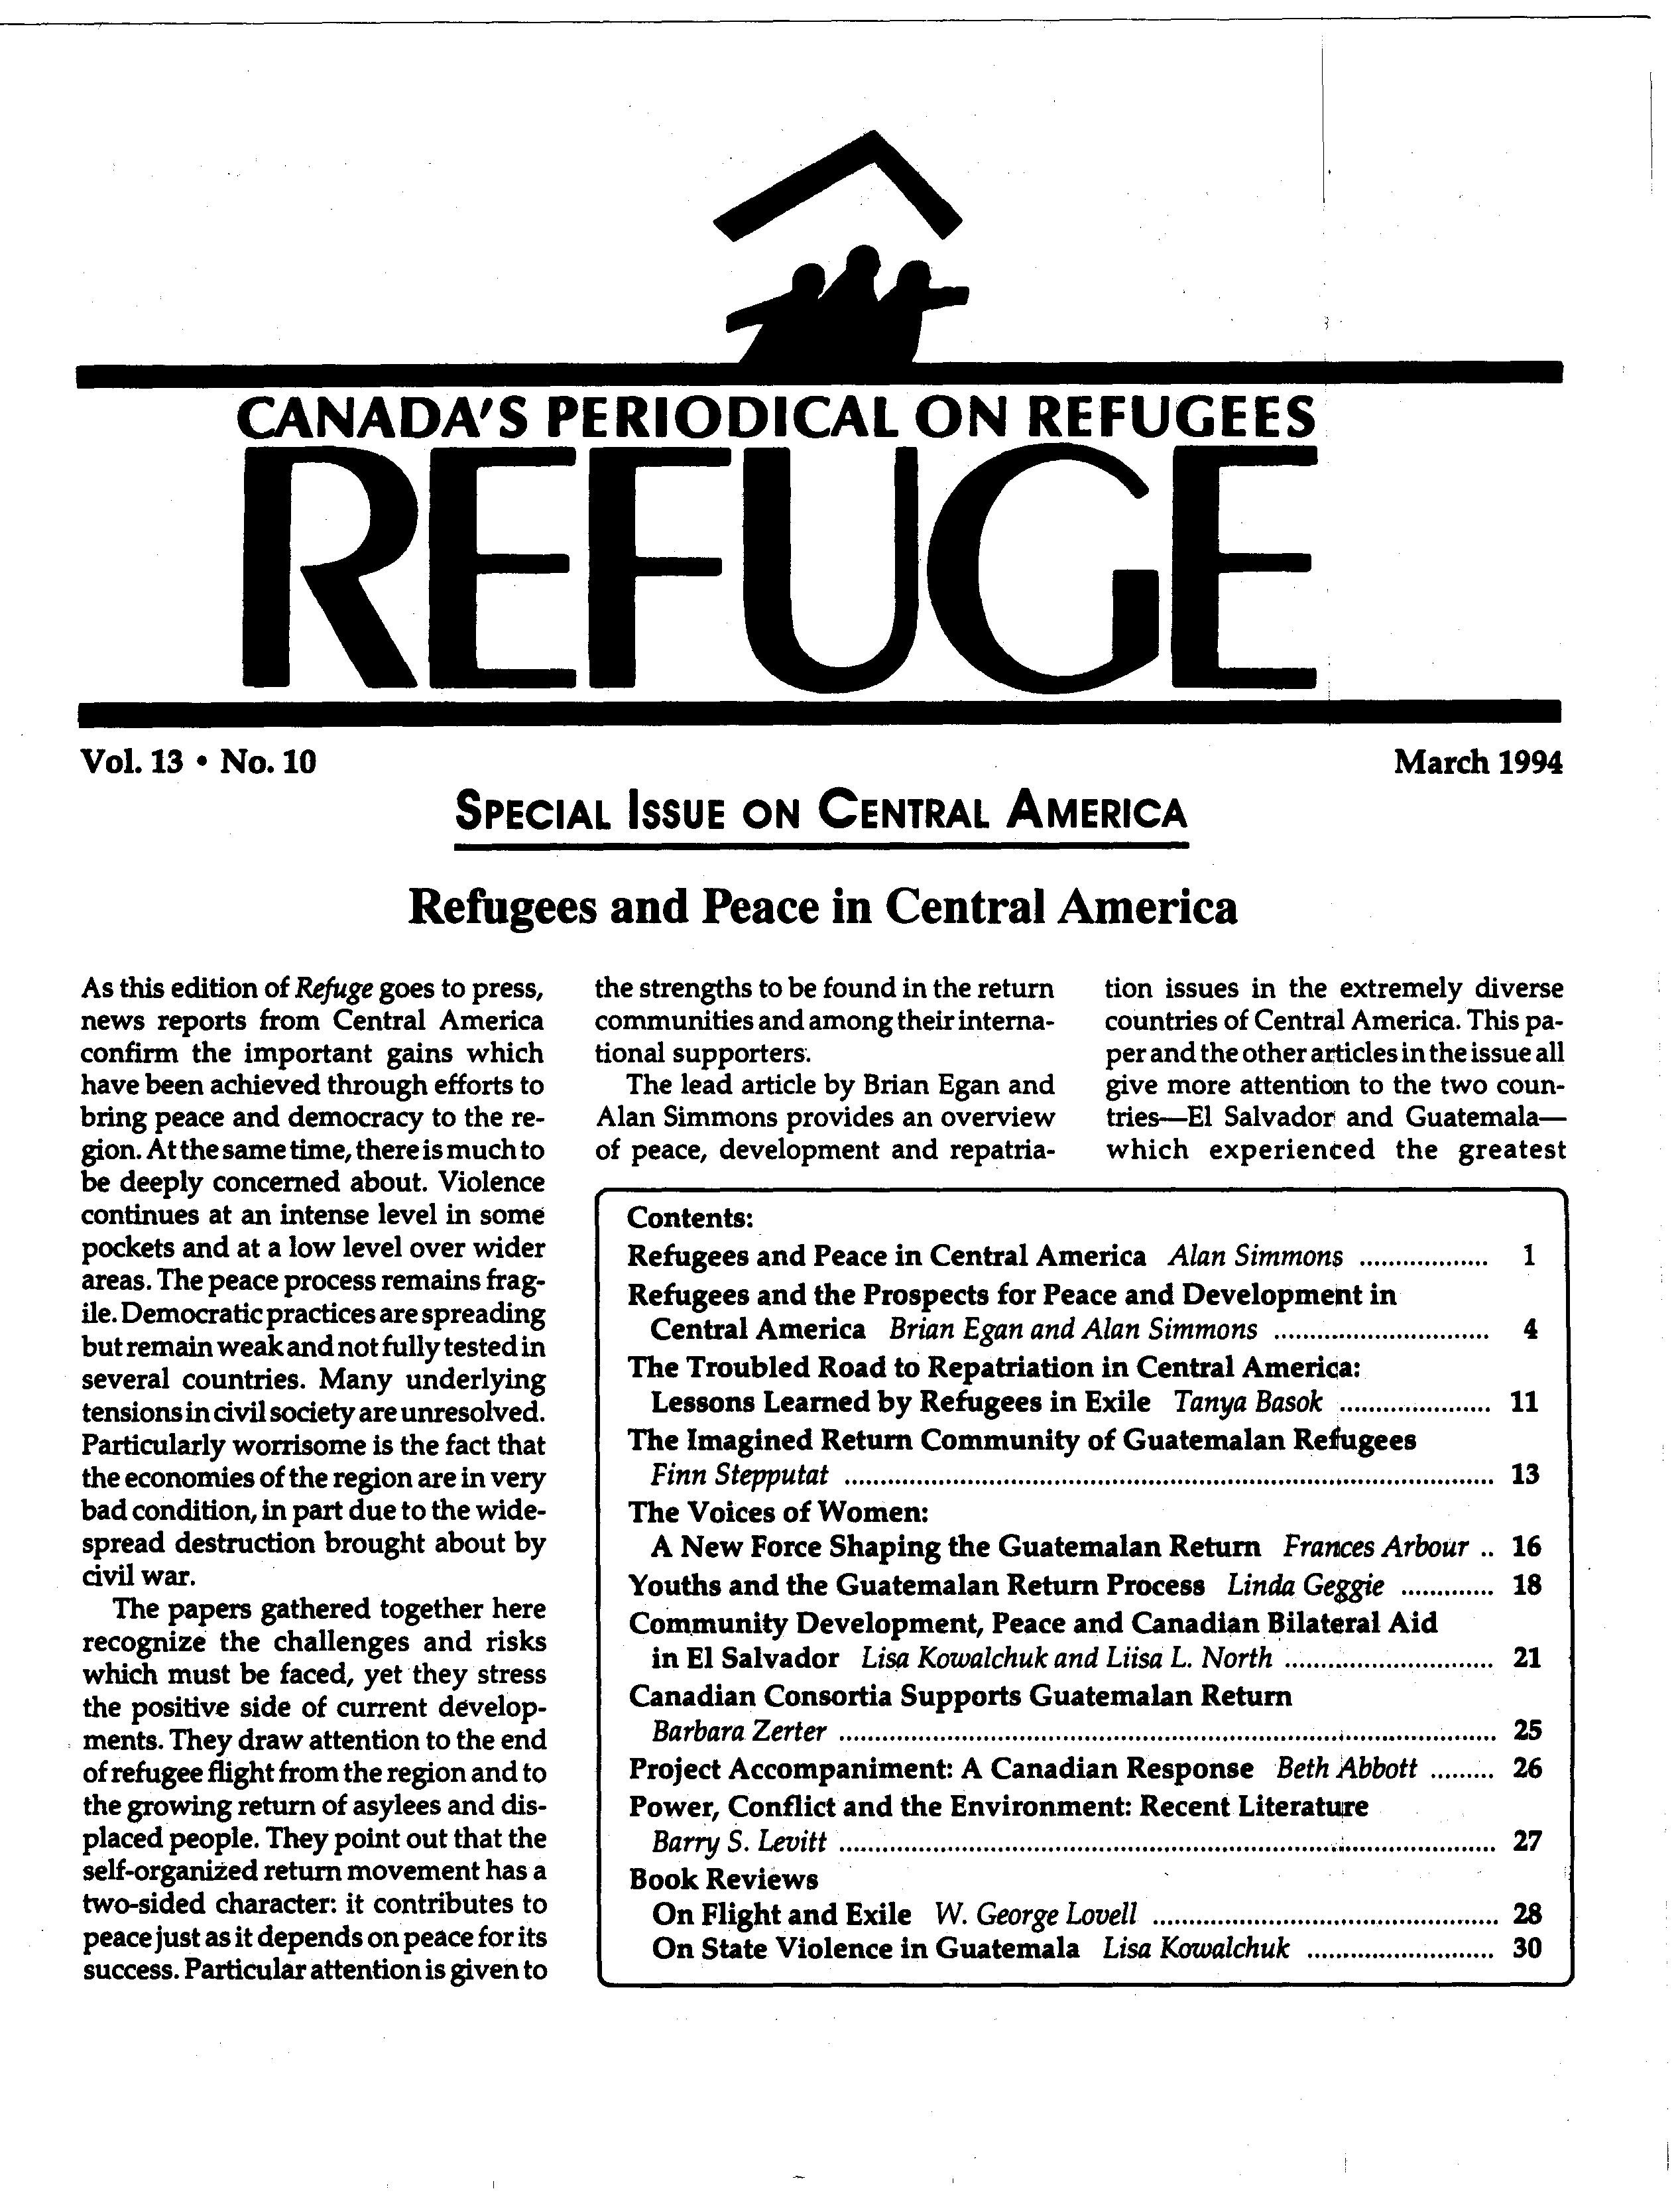 first page Refuge vol. 13.10 1994